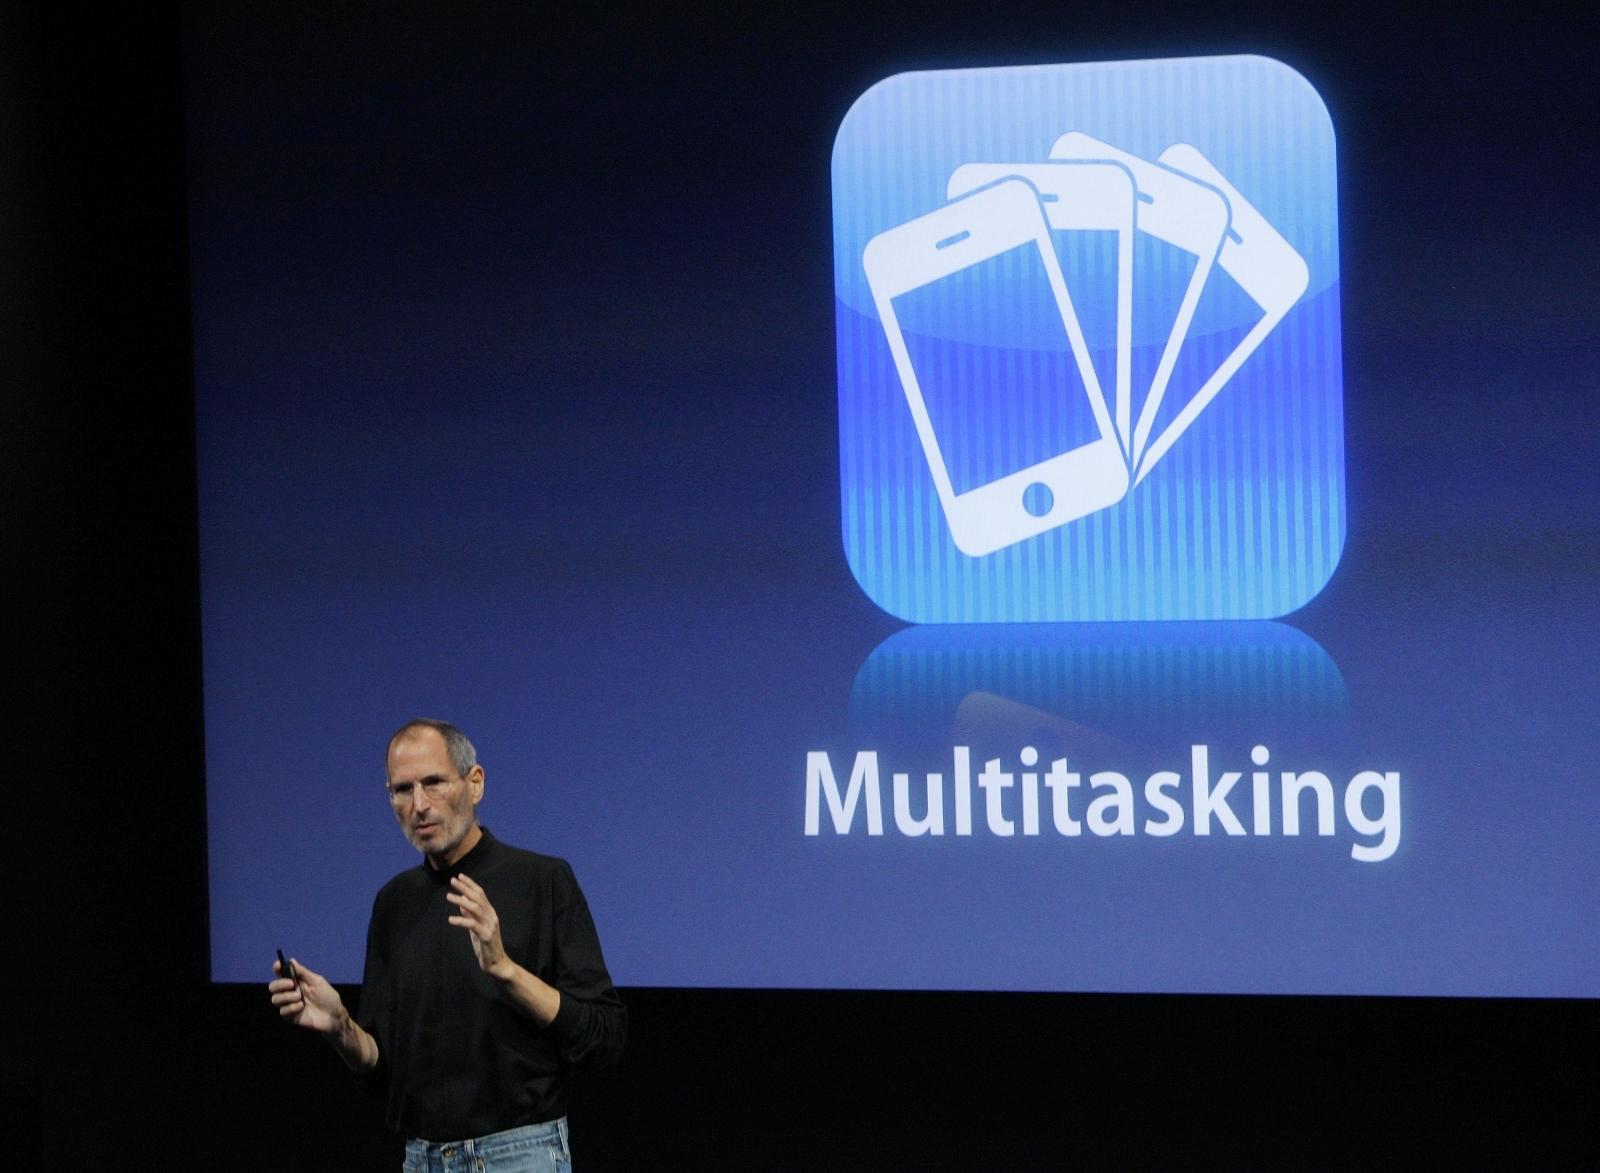 Steve Jobs iPhone event